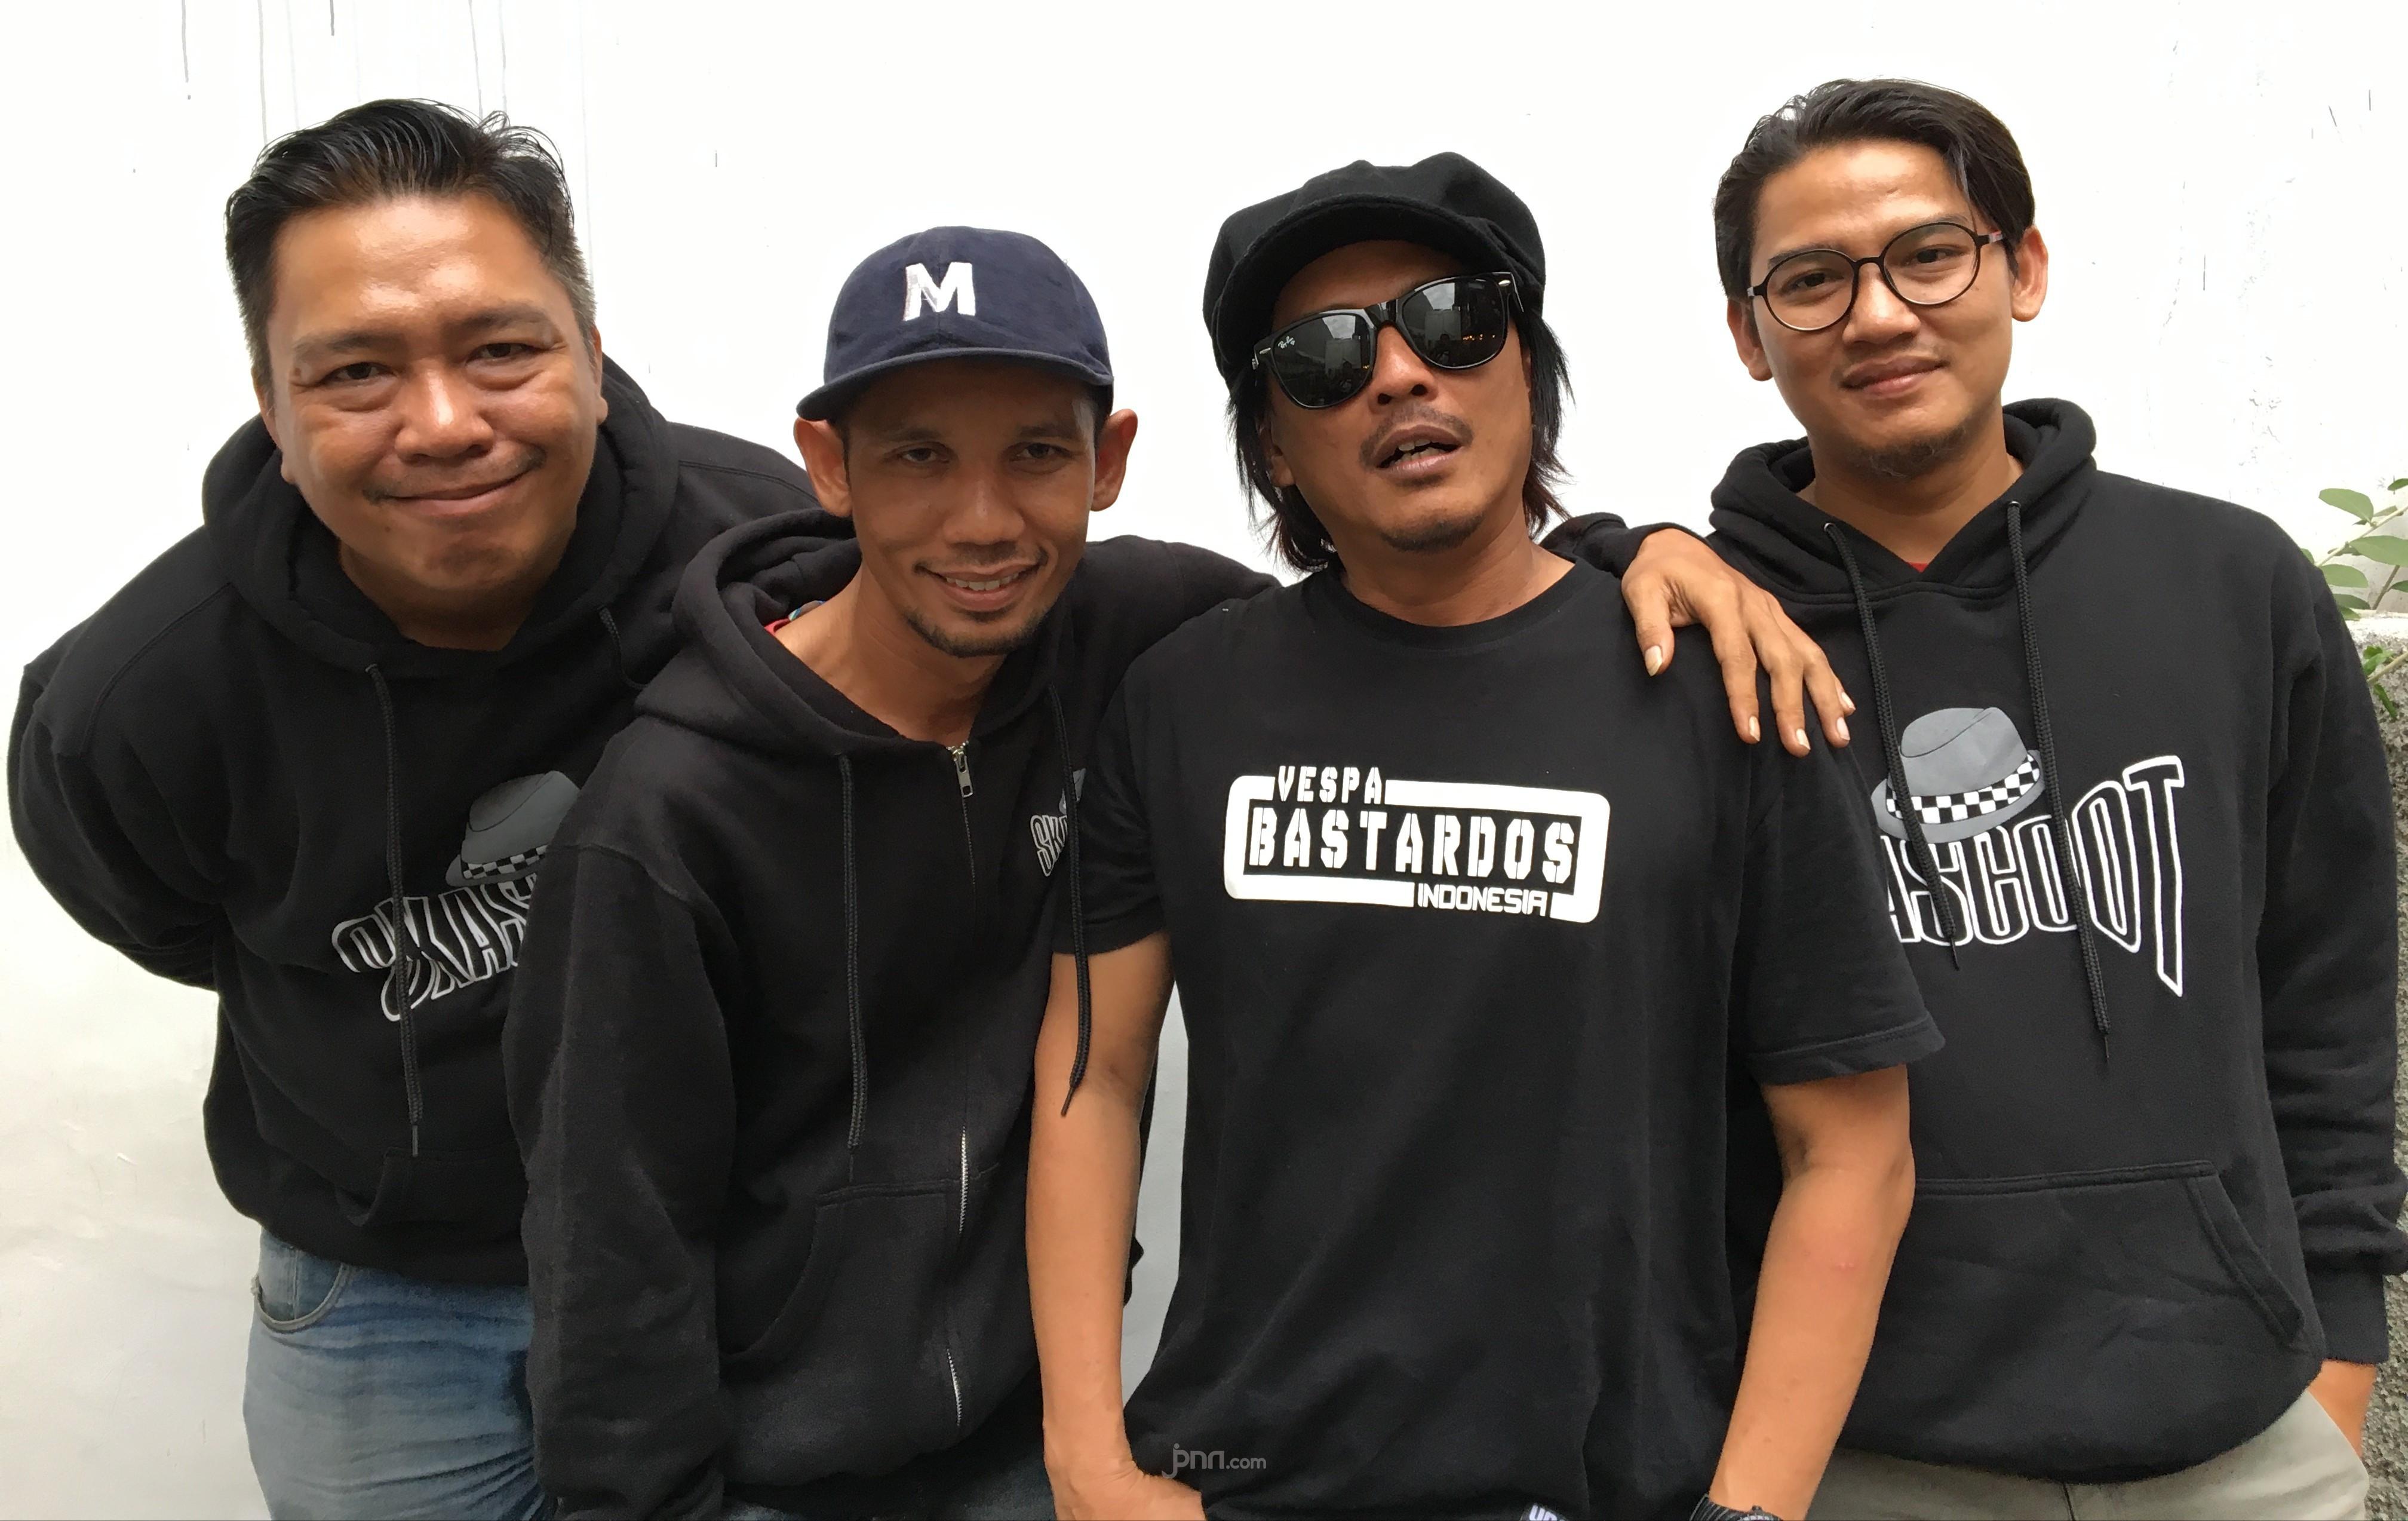 SkaScoot Melaju dengan 'Asyikin Aja' - JPNN.com